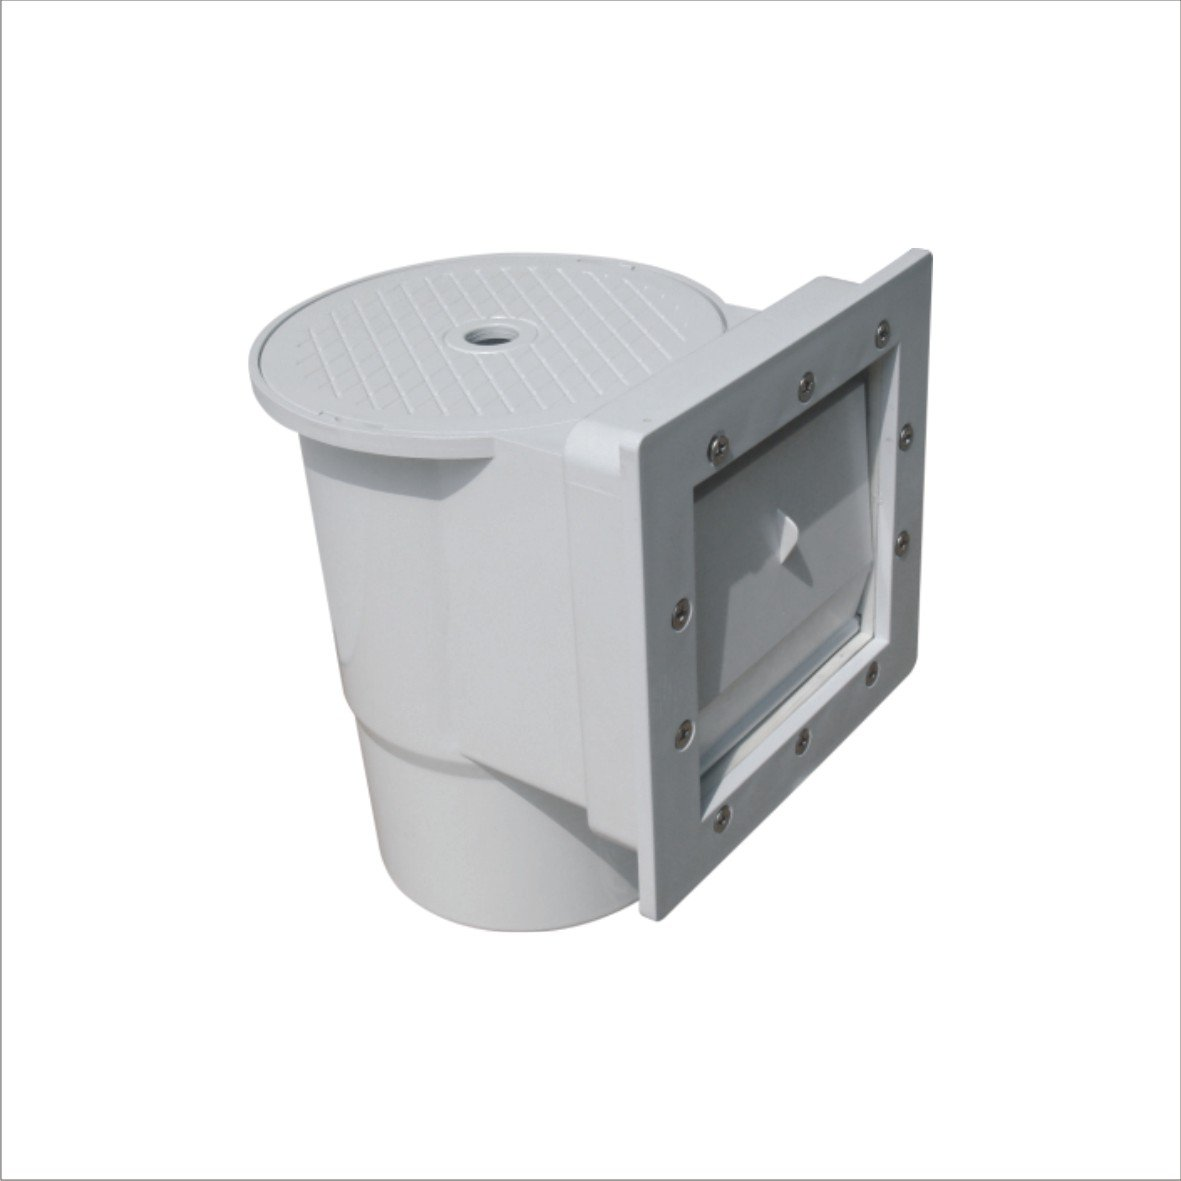 Heater Block Cover MK7//MK8//MK9 5 3D Printer Accessories Pcs MK8 Silicone Socks